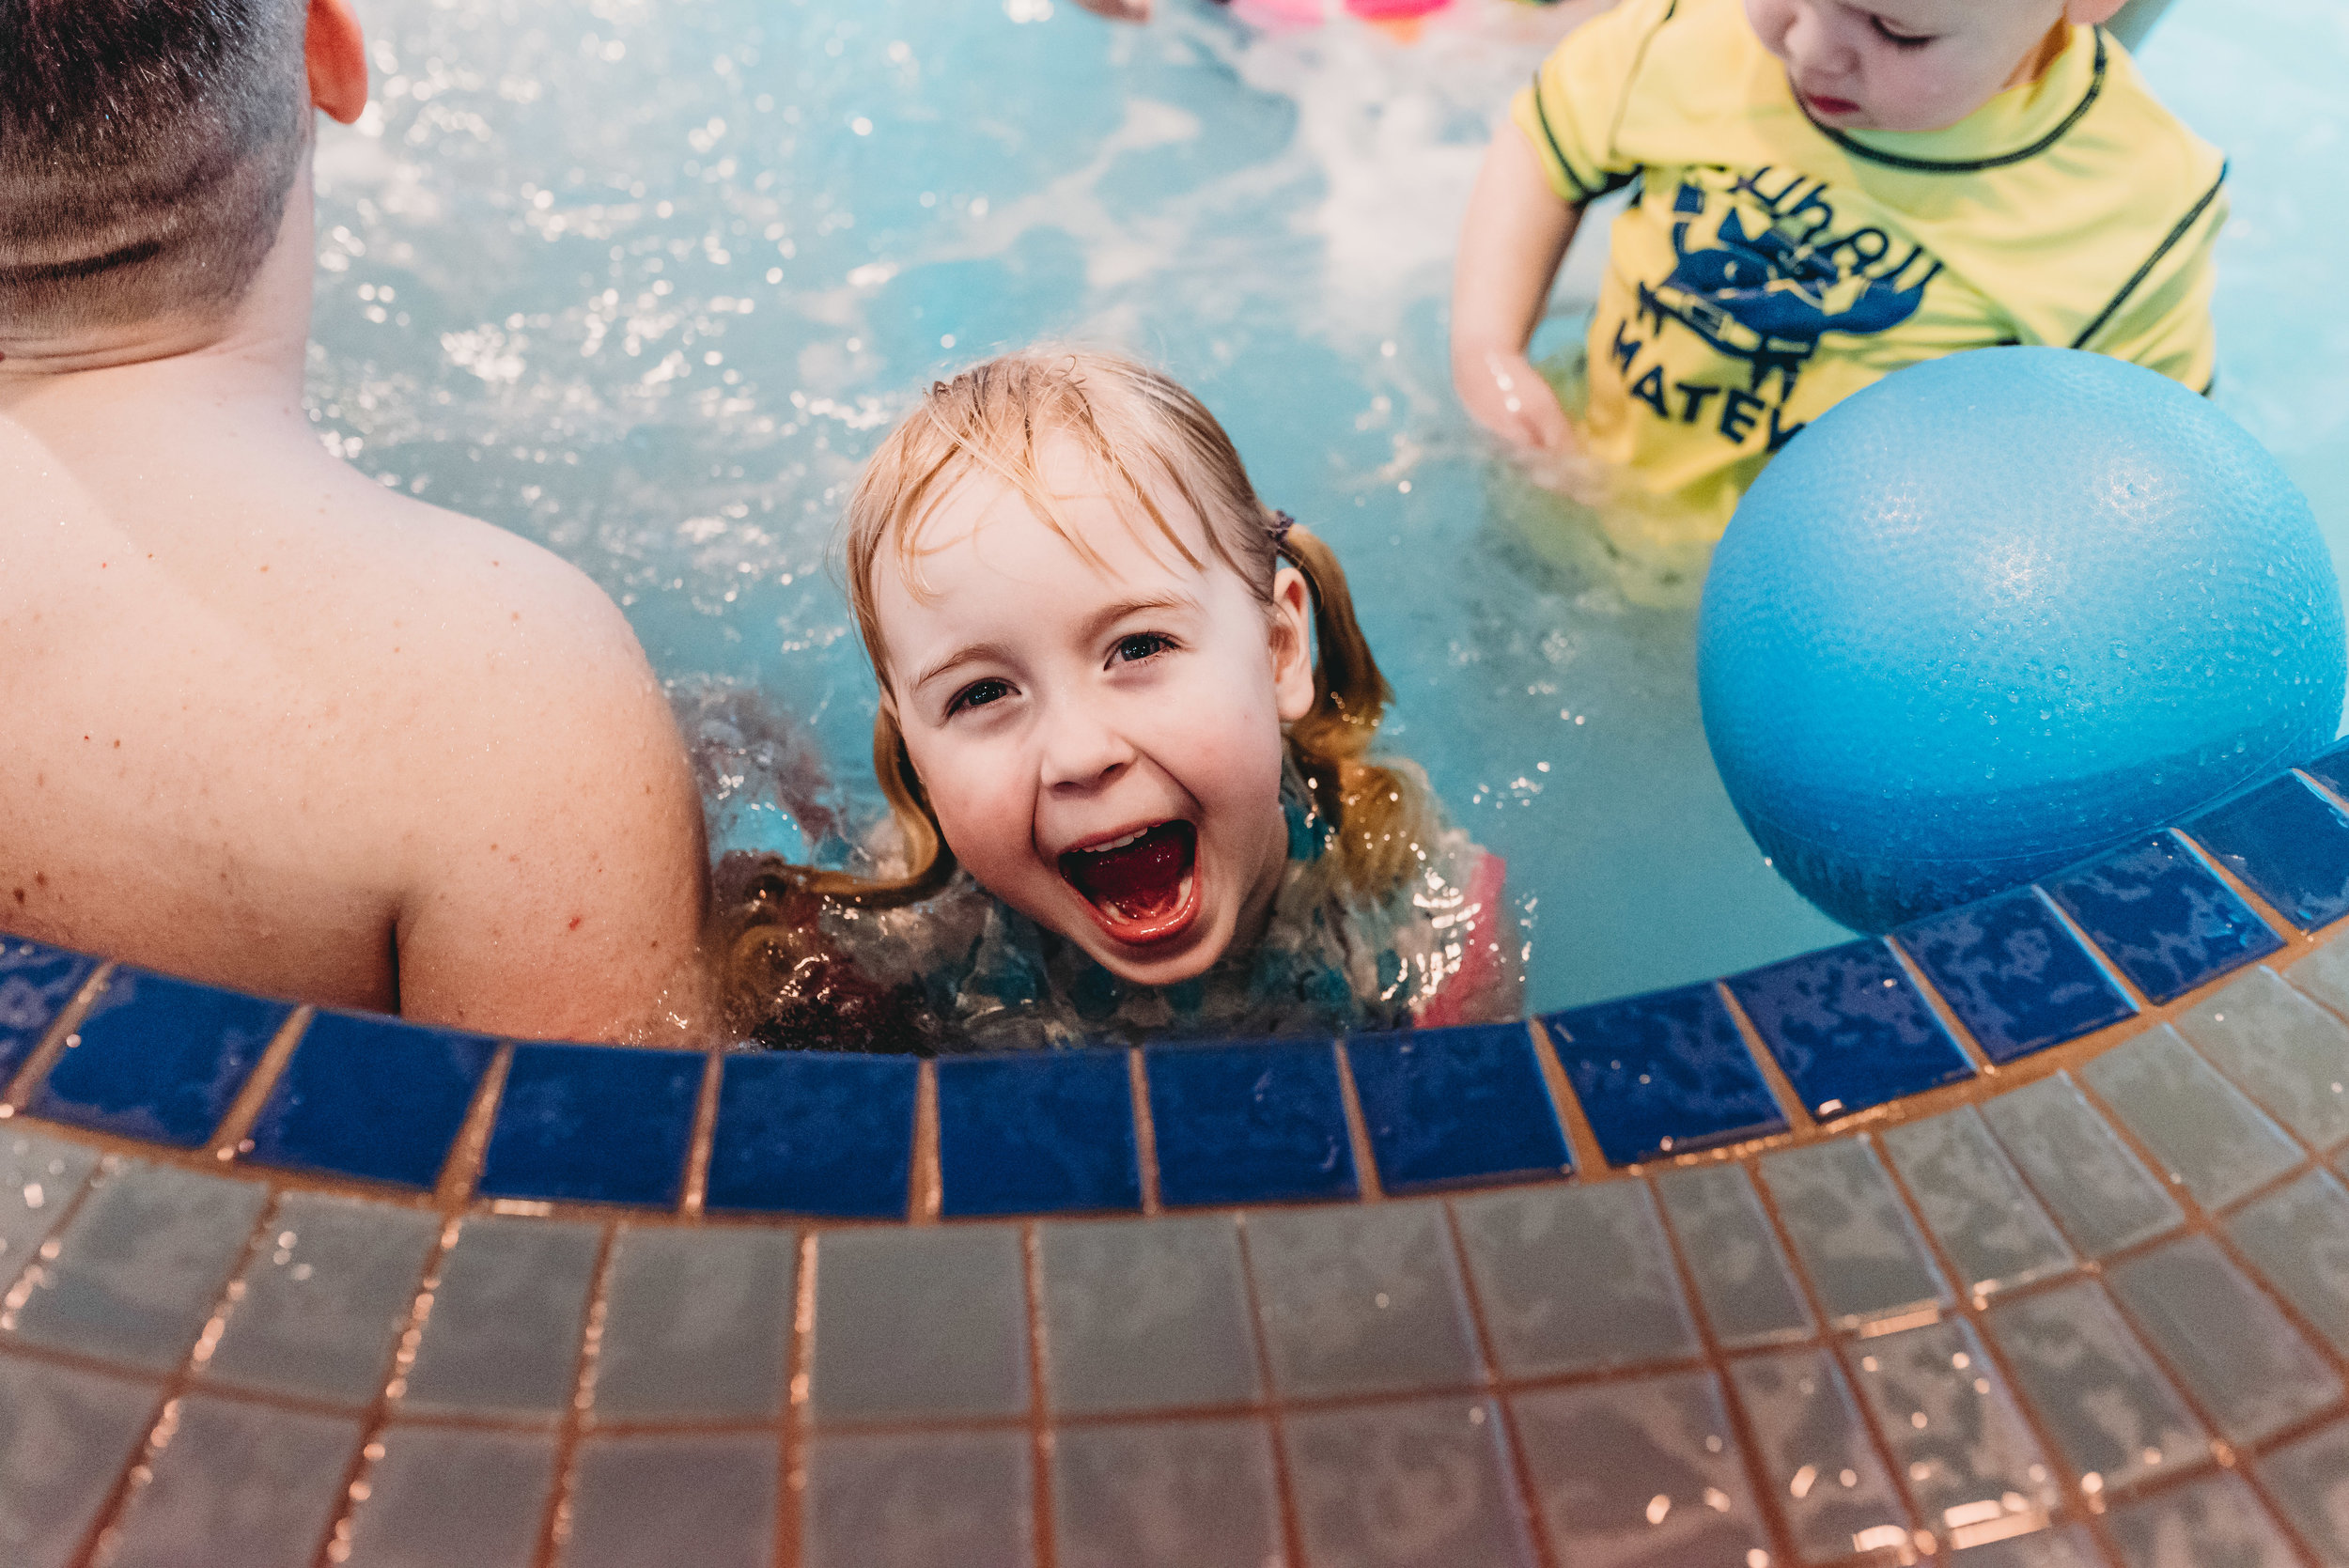 Nicola_Reiersen_Photography_Kids_Birthday_Pool_Party (18).jpg